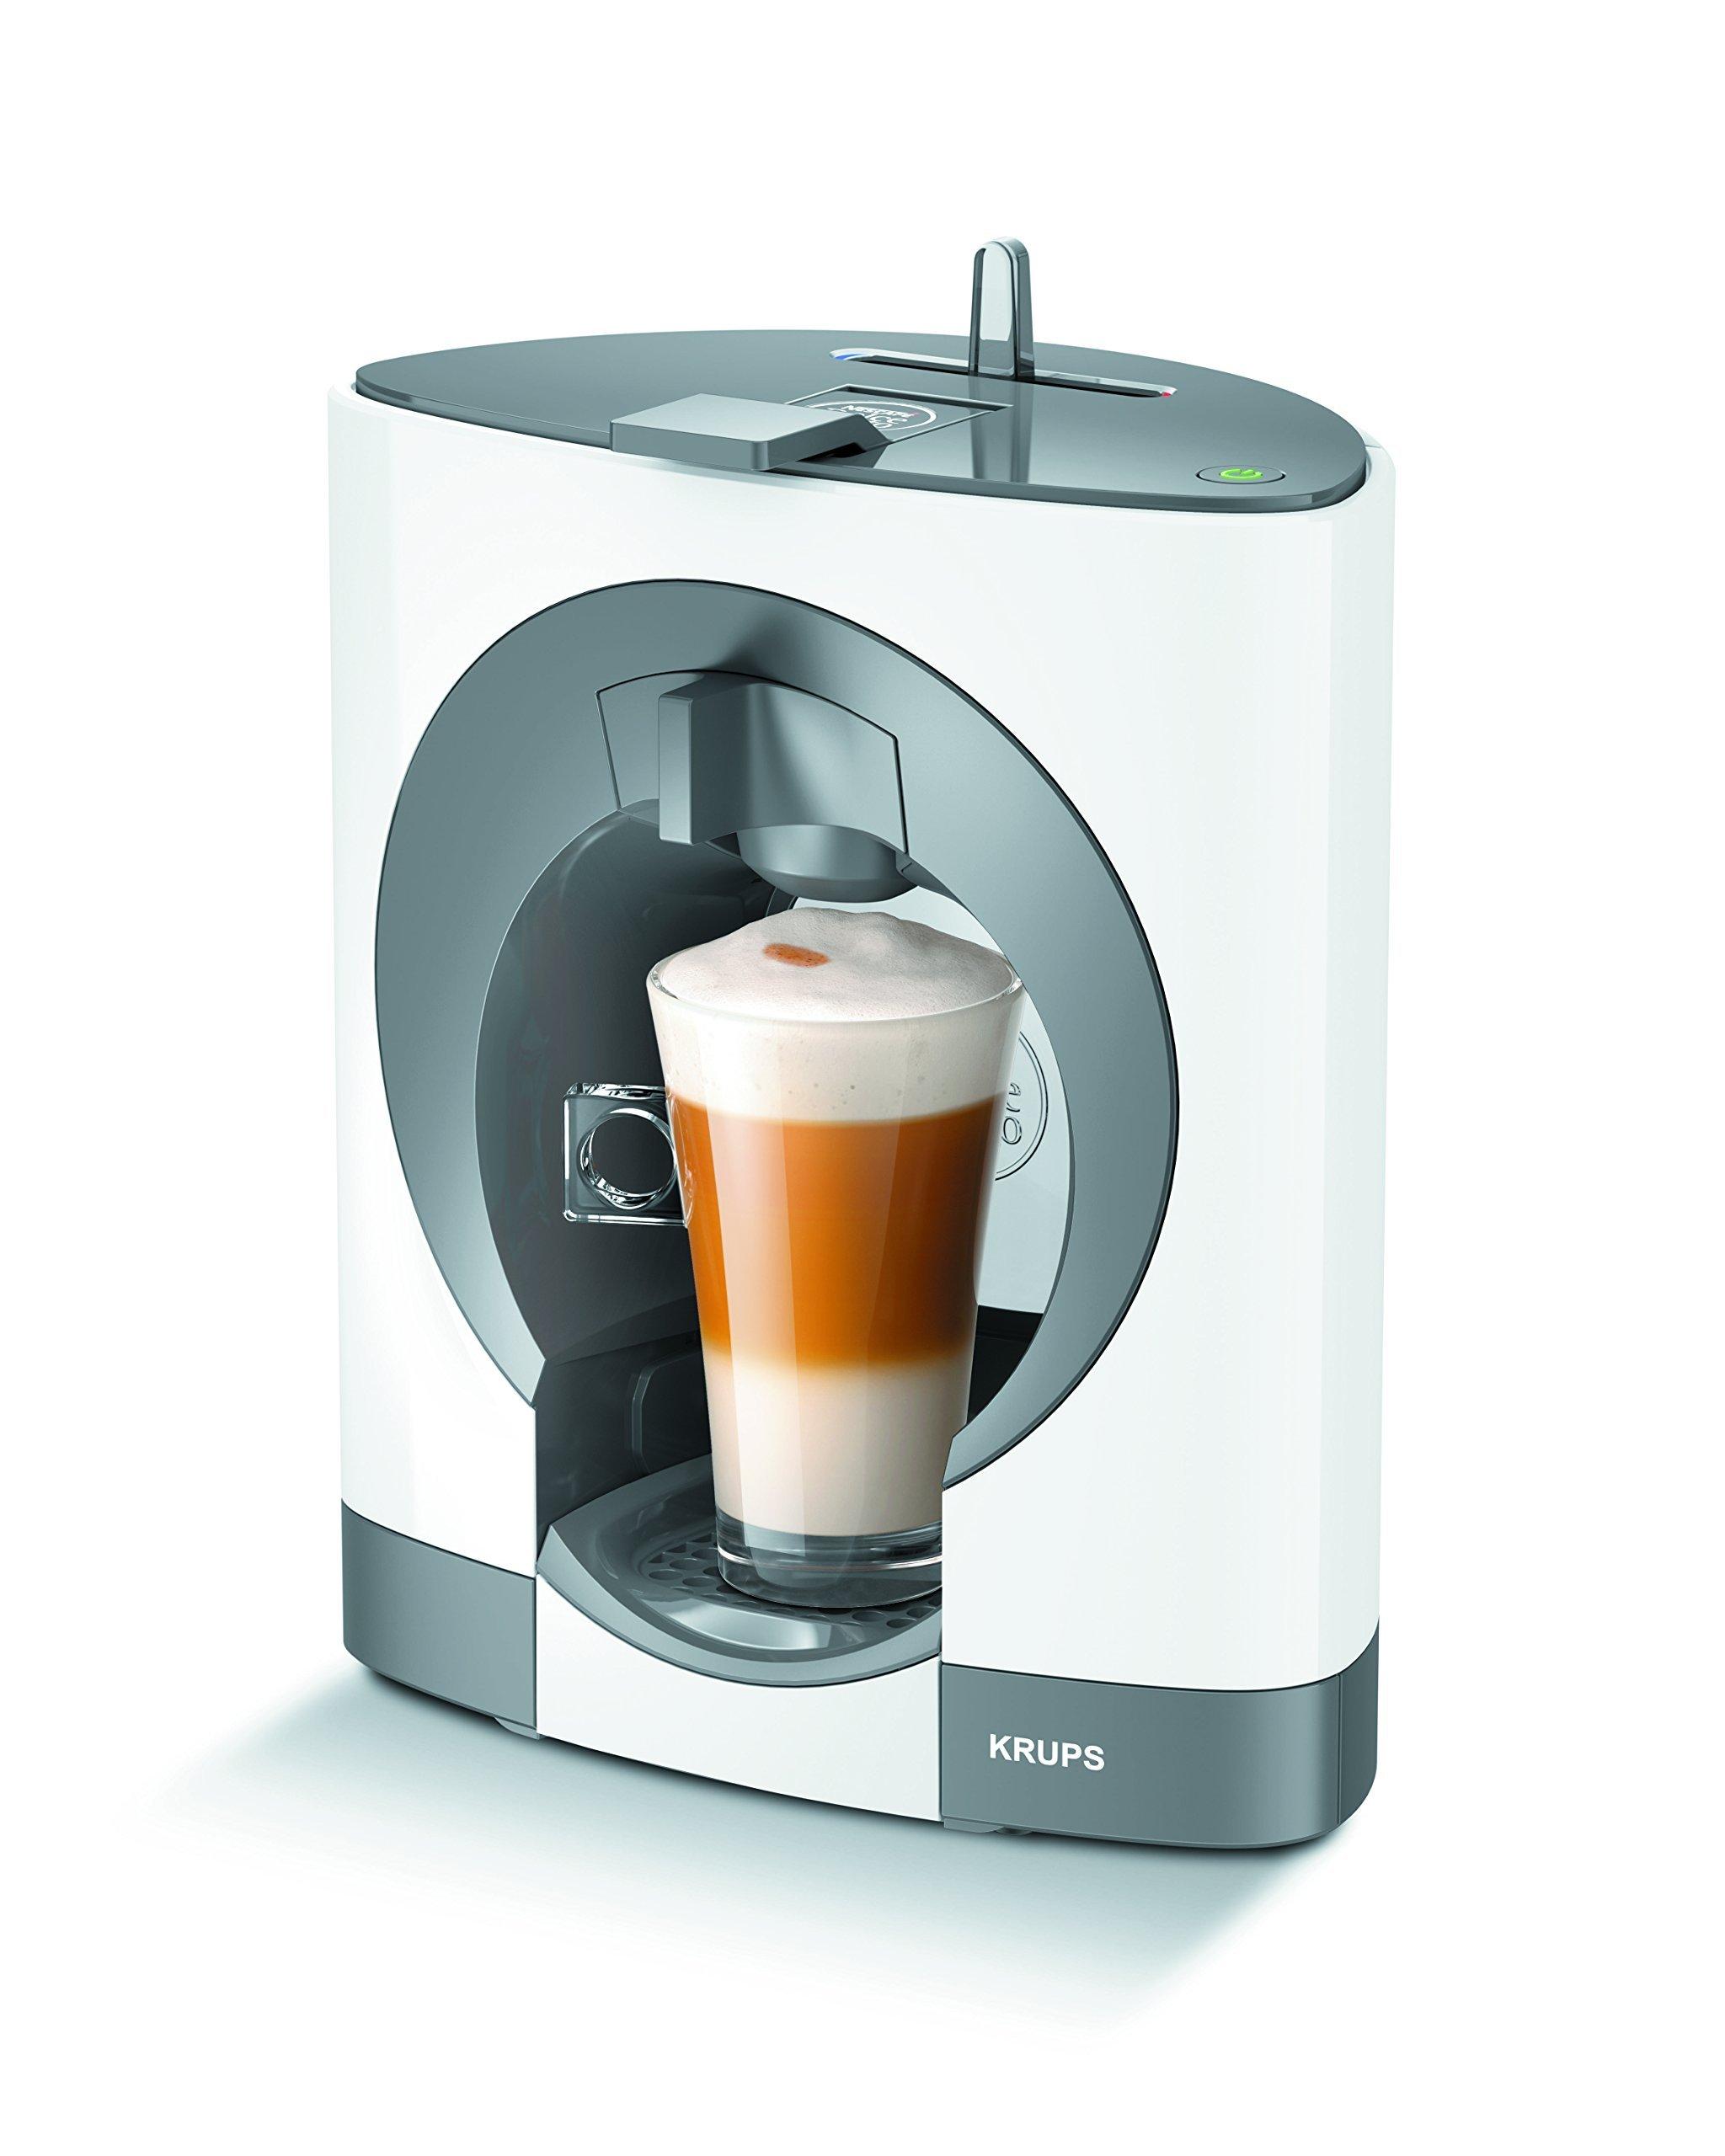 Krups Dolce Gusto Oblo KP1101 - Cafetera de cápsulas, 15 bares de presión, color blanco (Reacondicionado): Amazon.es: Hogar